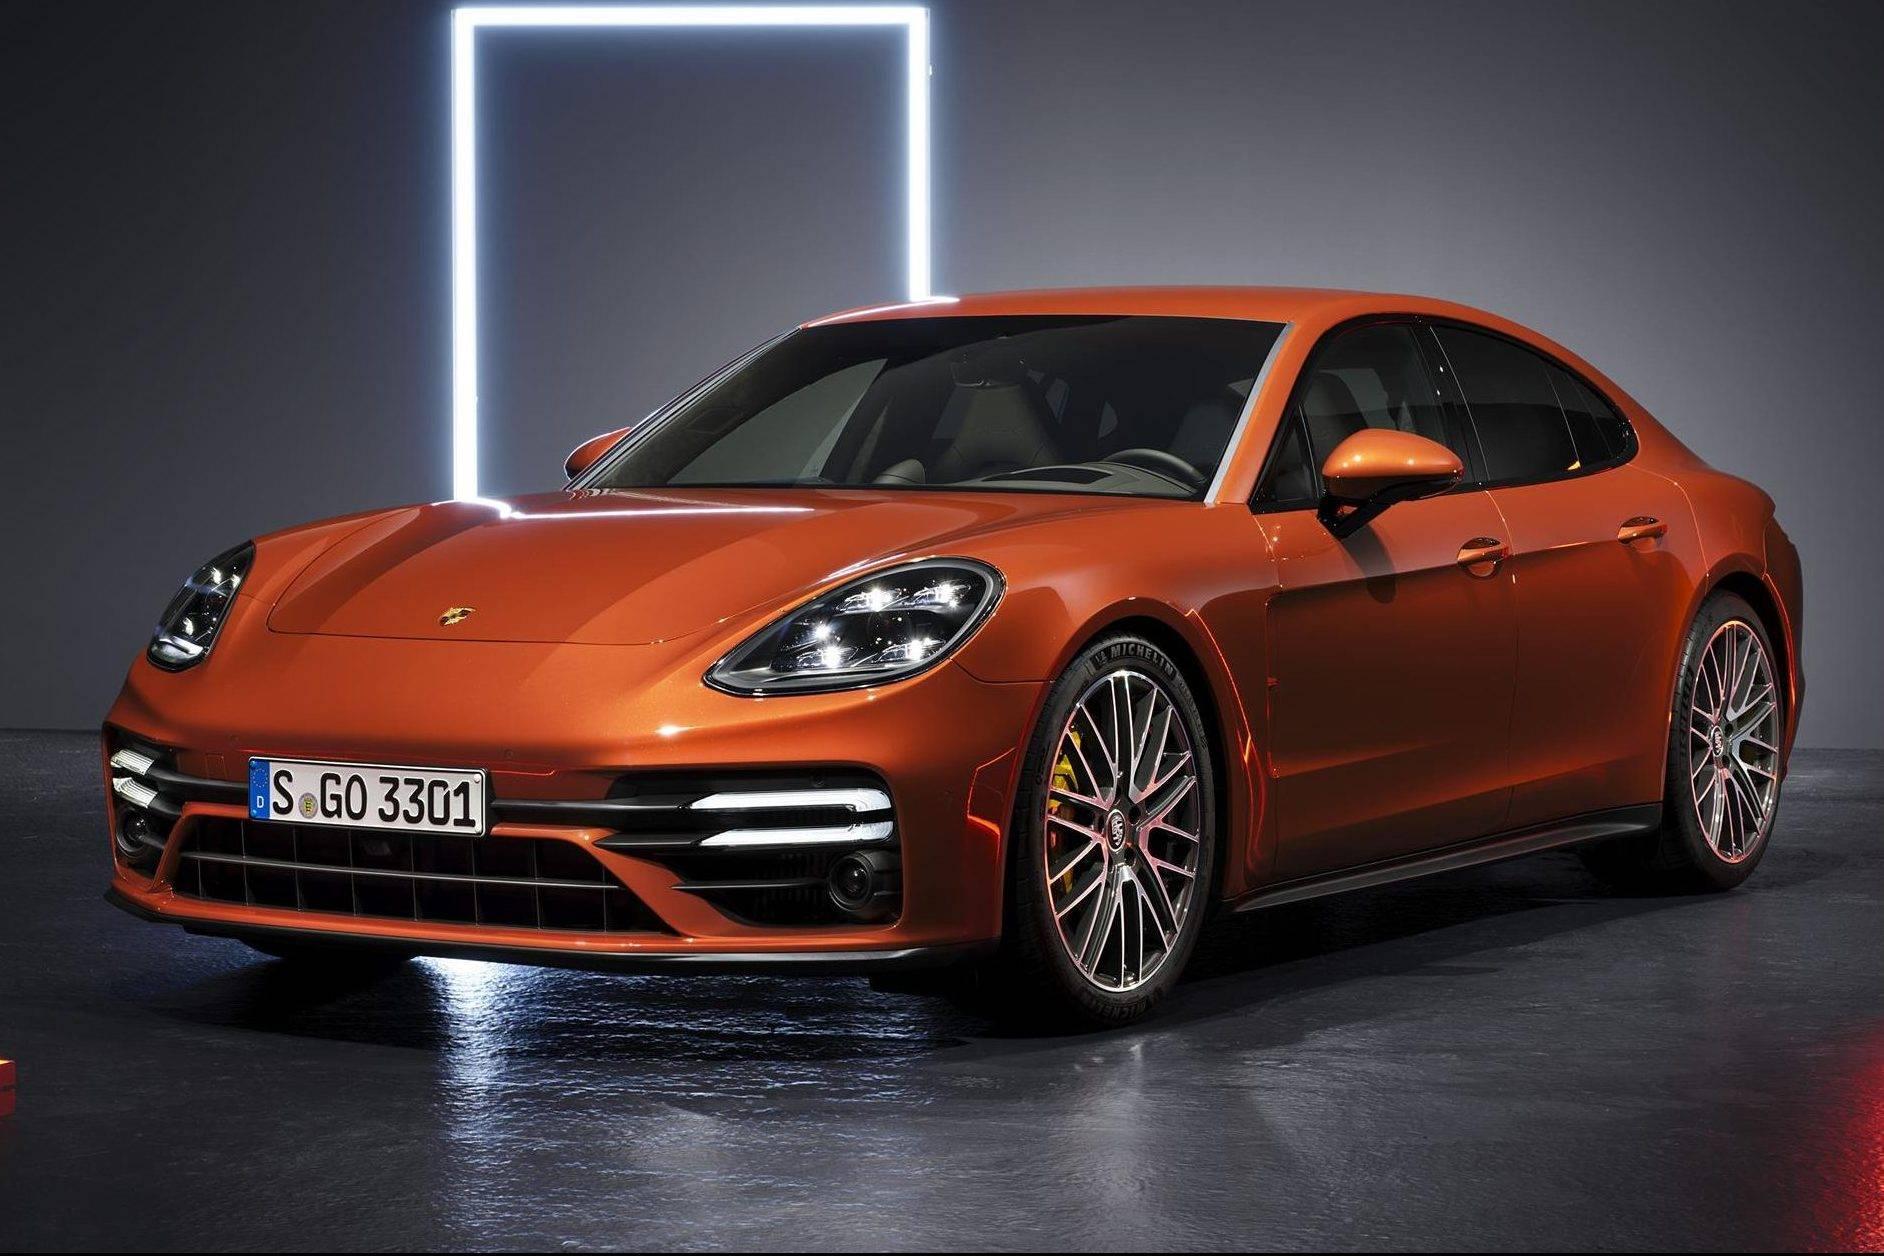 Novo Porsche Panamera chega mais potente e eficiente